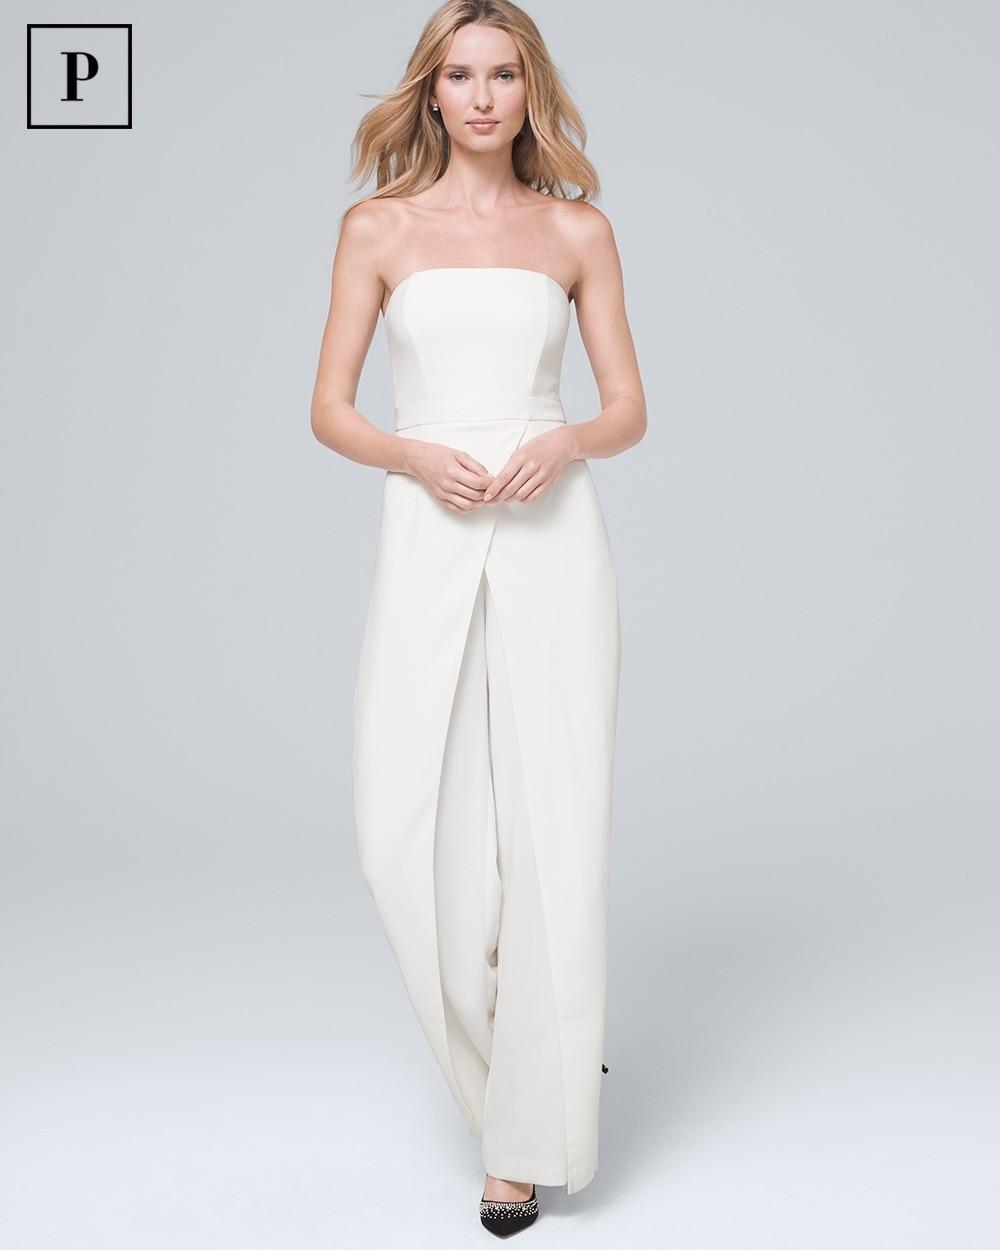 Petite Convertible White Strapless Split Leg Jumpsuit White House